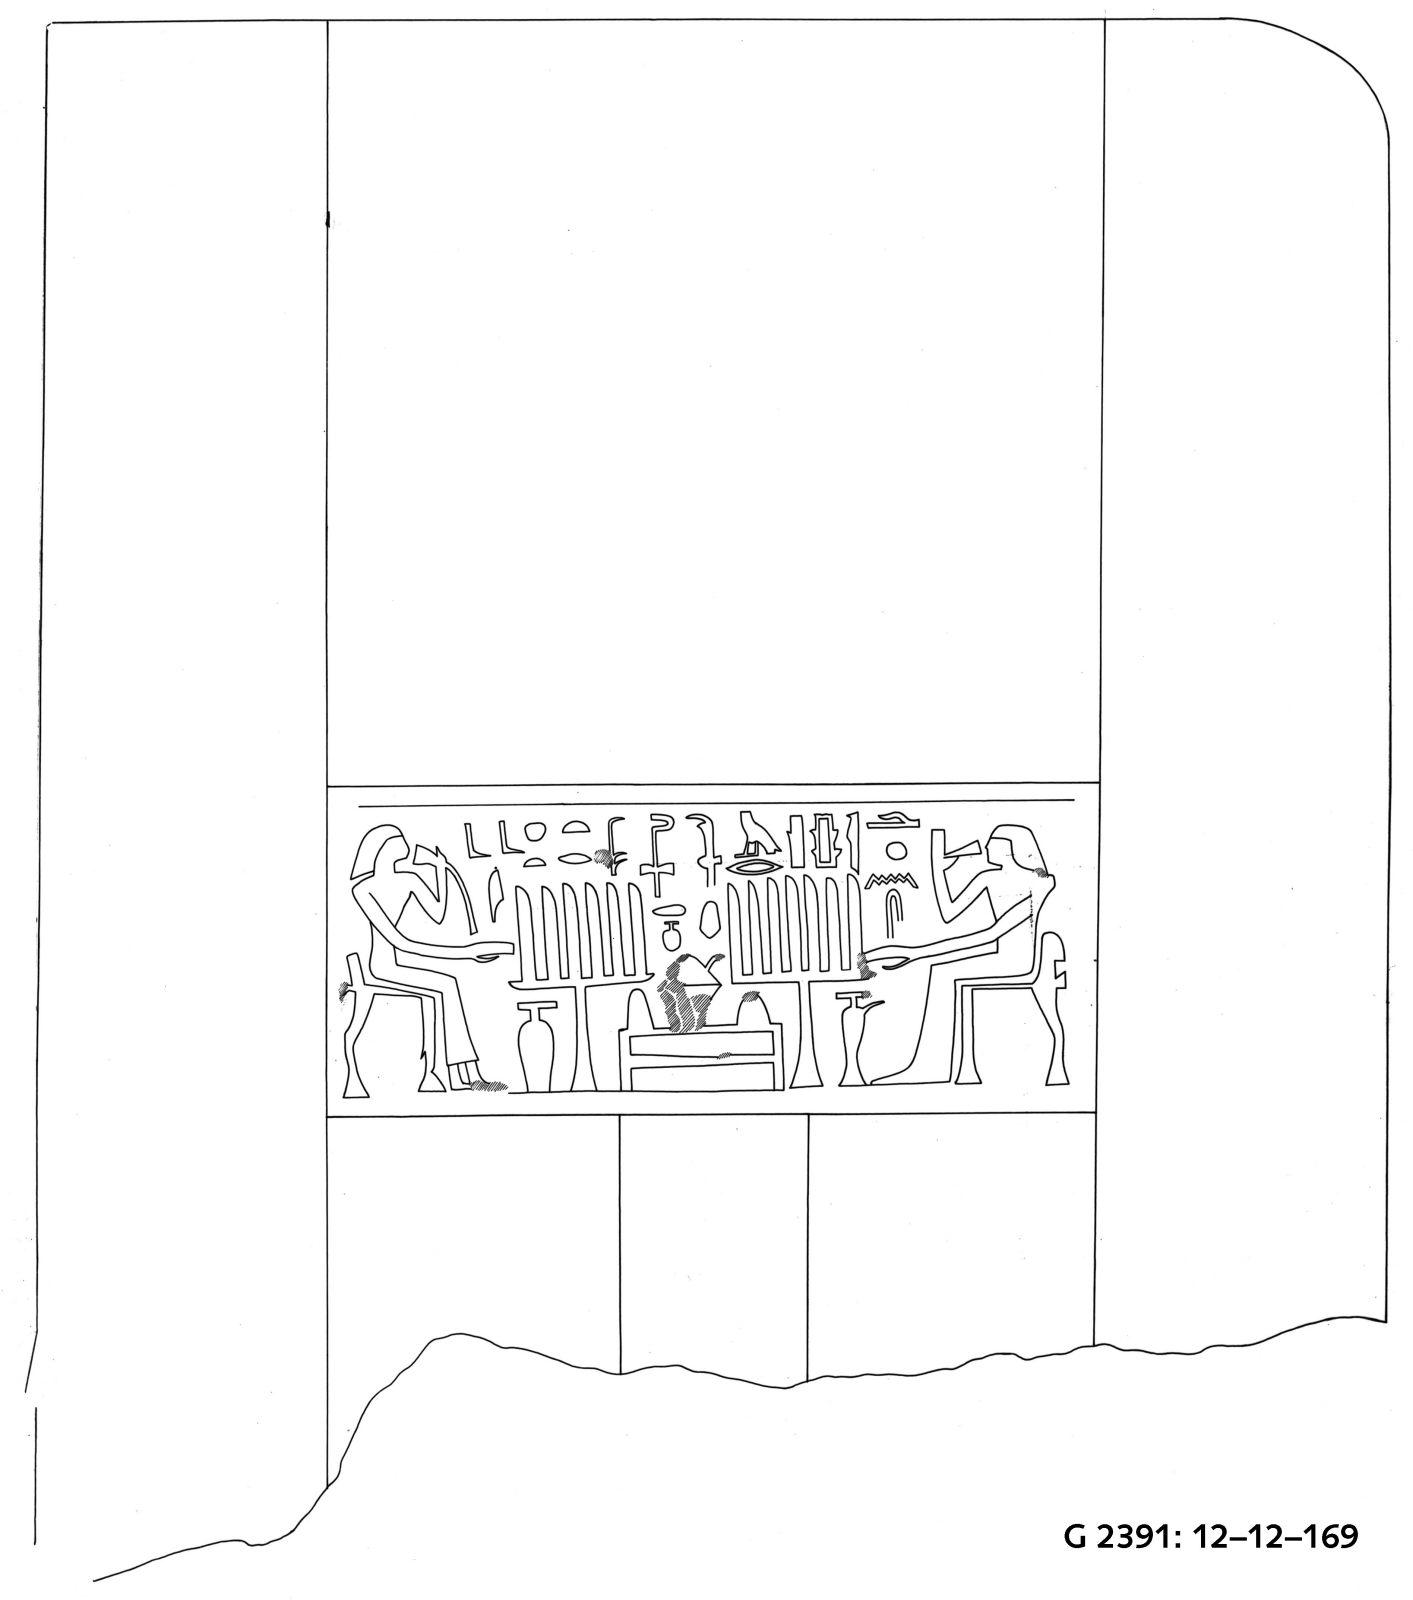 Drawings: G 2391: false door of Bebi, upper part